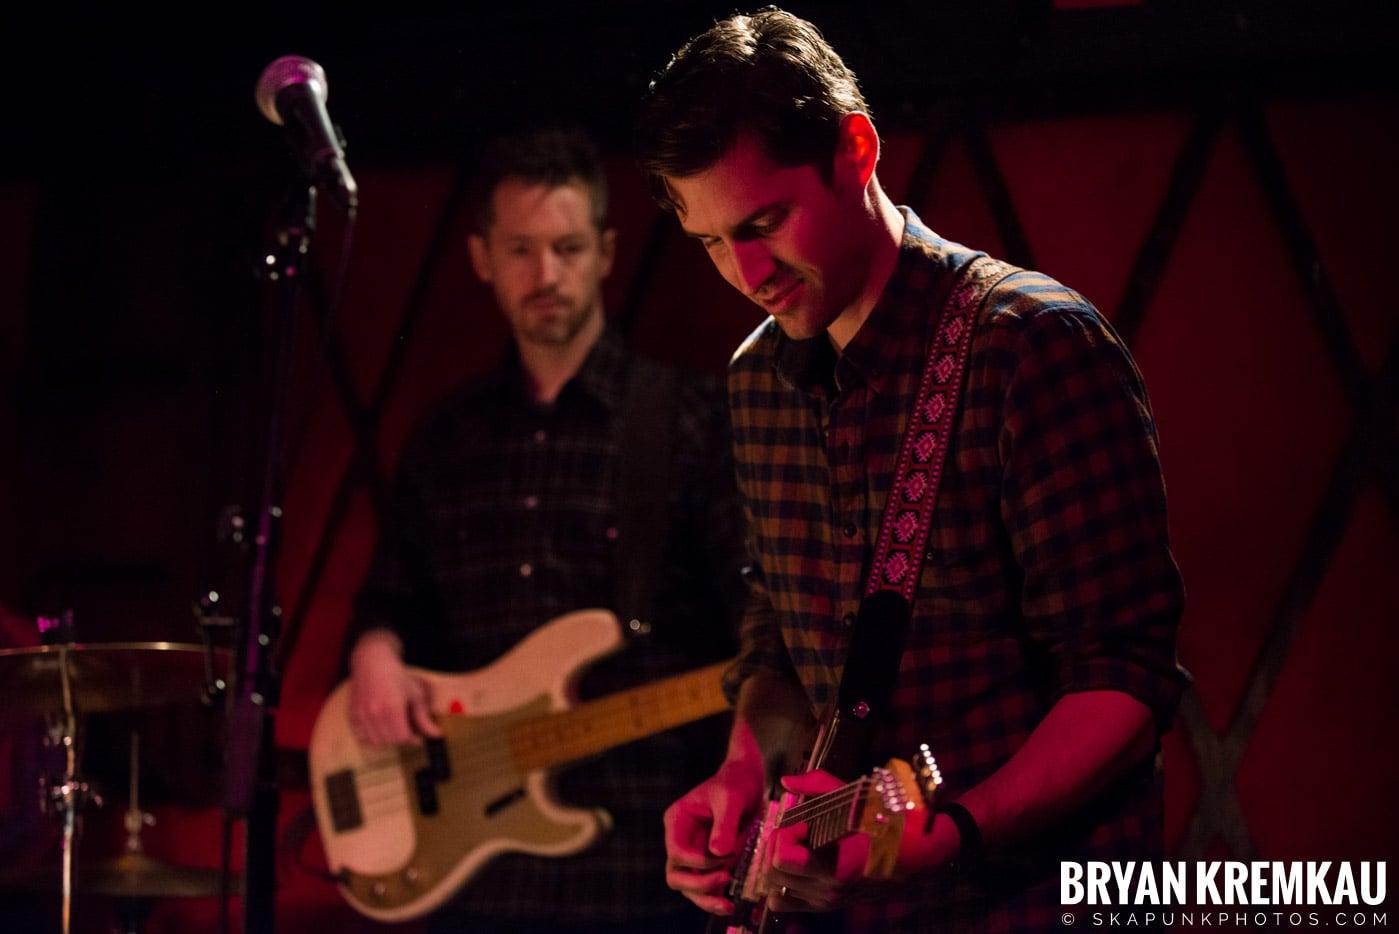 Peter Bradley Adams @ Rockwood Music Hall, NYC - 3.9.13 (16)